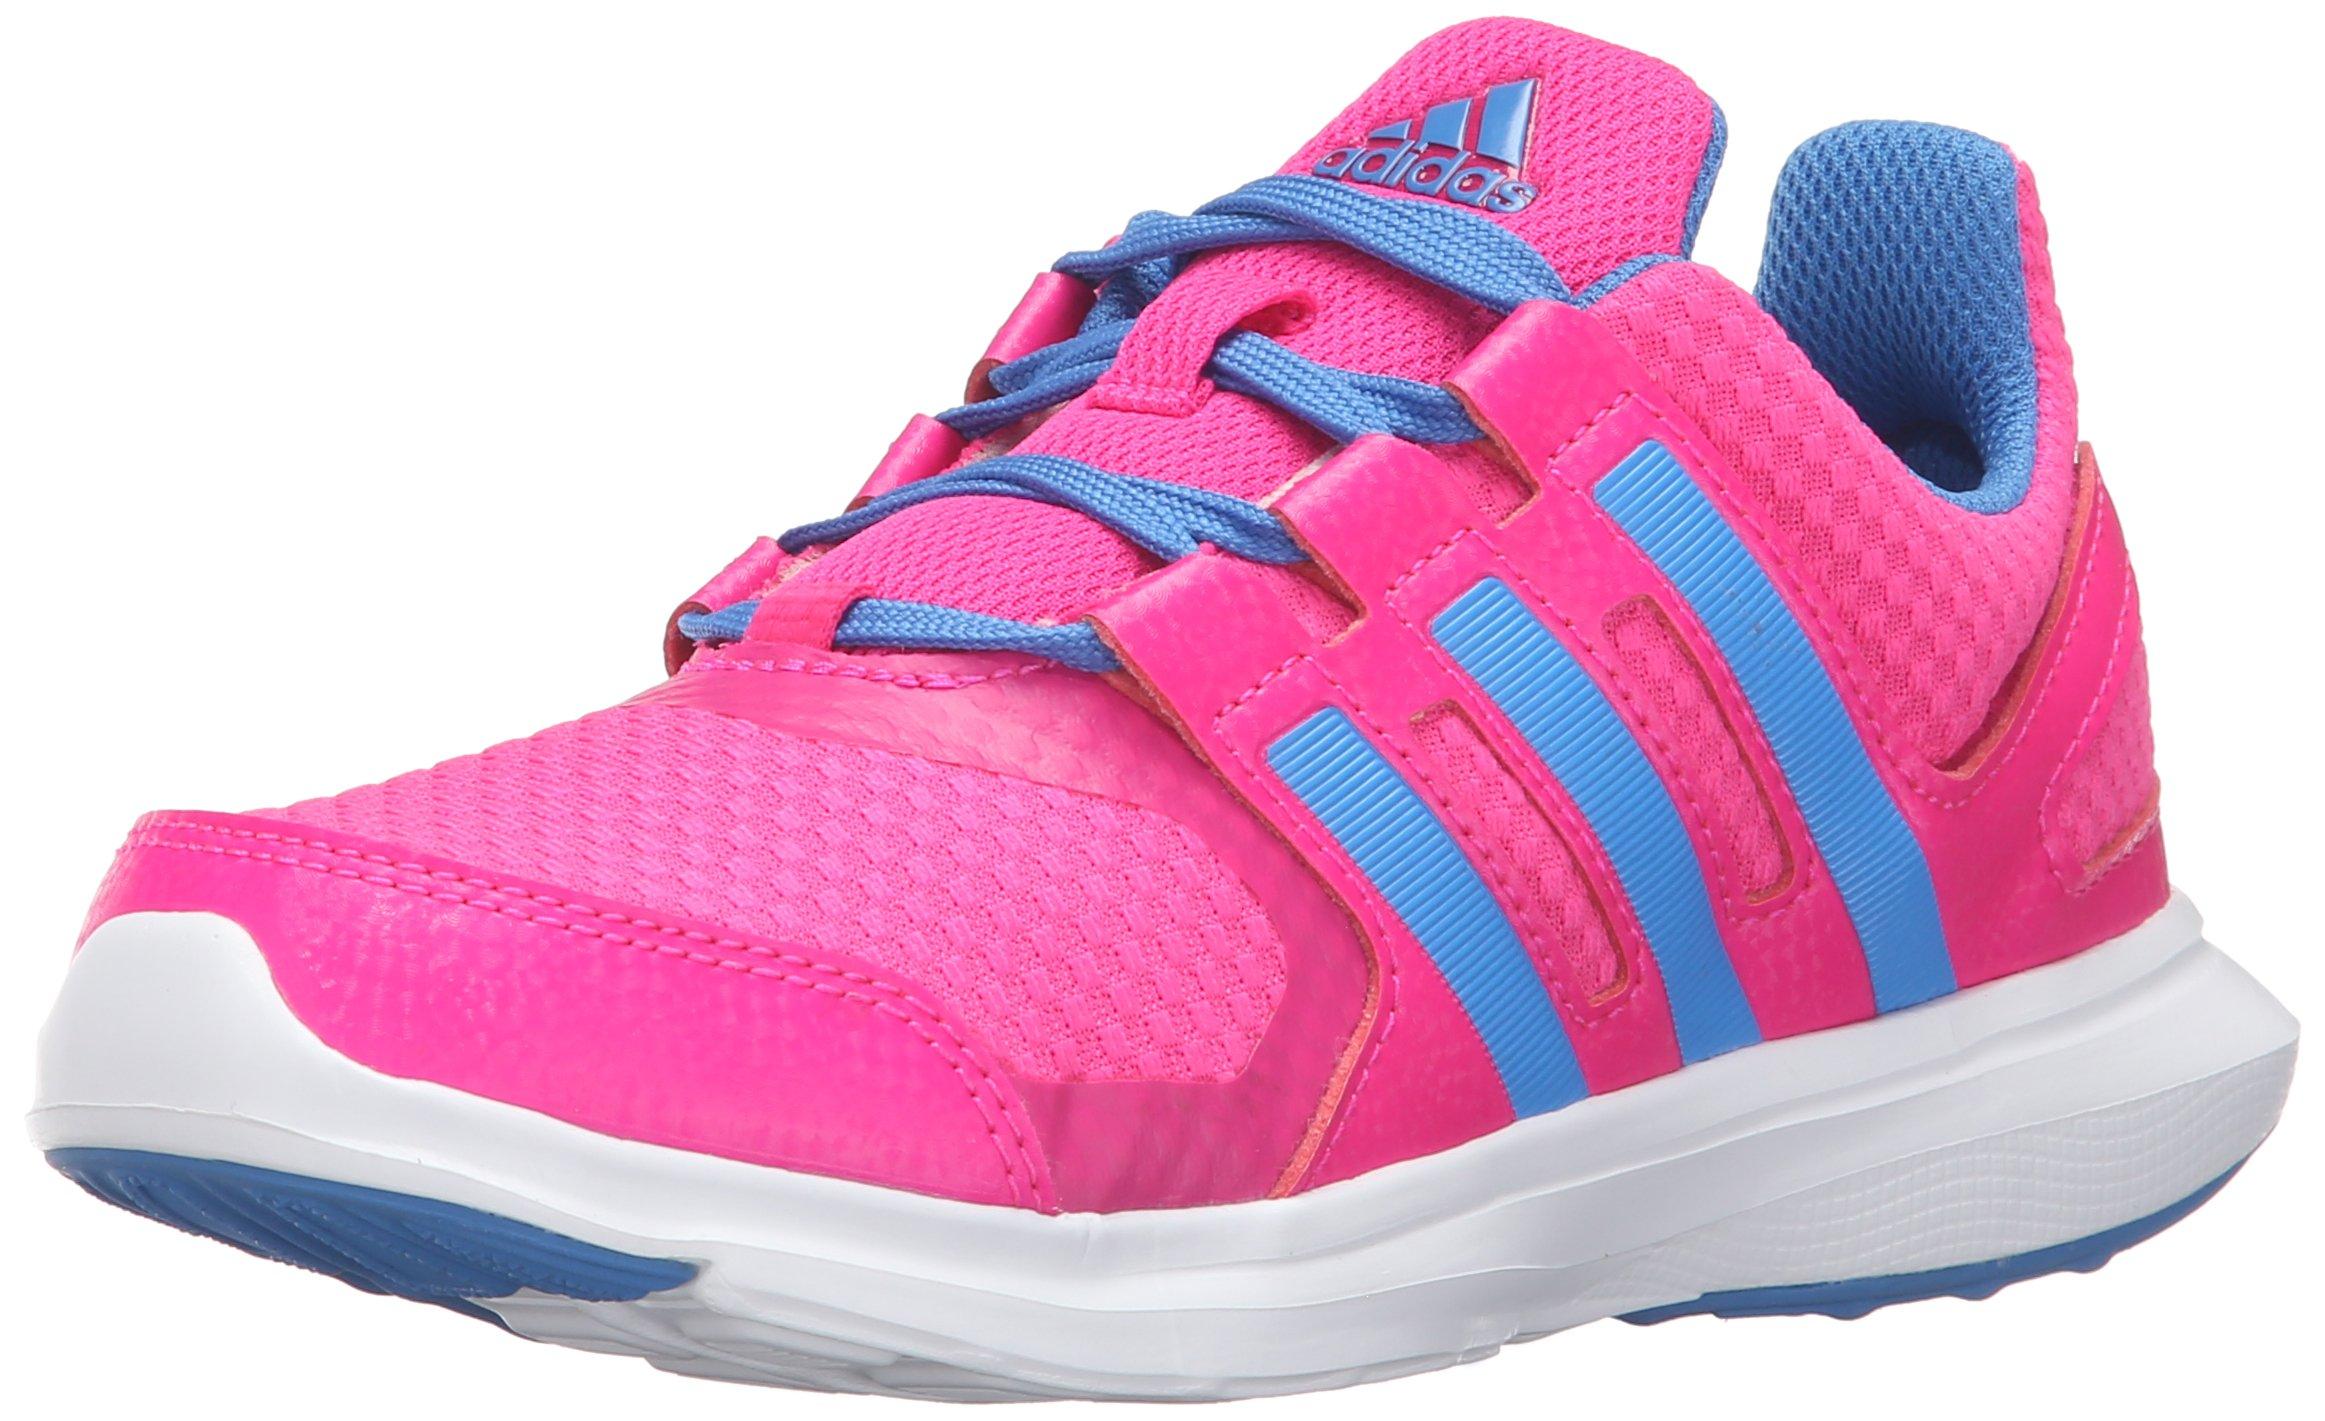 338f2643de adidas Girls' Hyperfast 2.0 k Running Shoe, Shock Pink/Ray Blue/White, 5.5  M US Big Kid